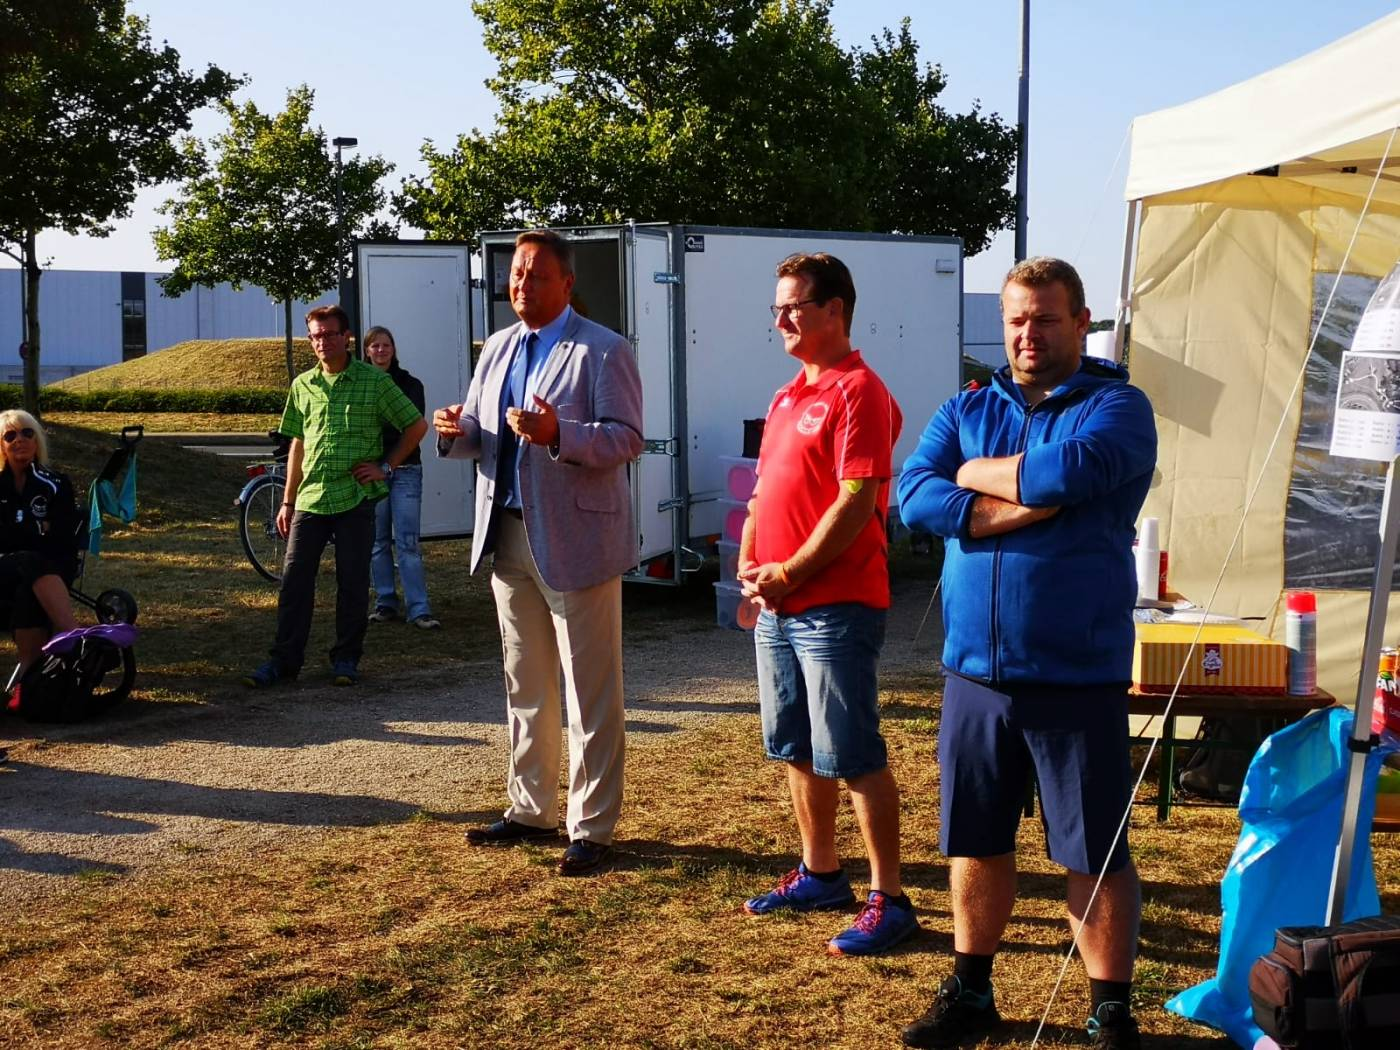 2018-09-02_NDS Landesmeisterschaft Discgolf Hannover 2018_007